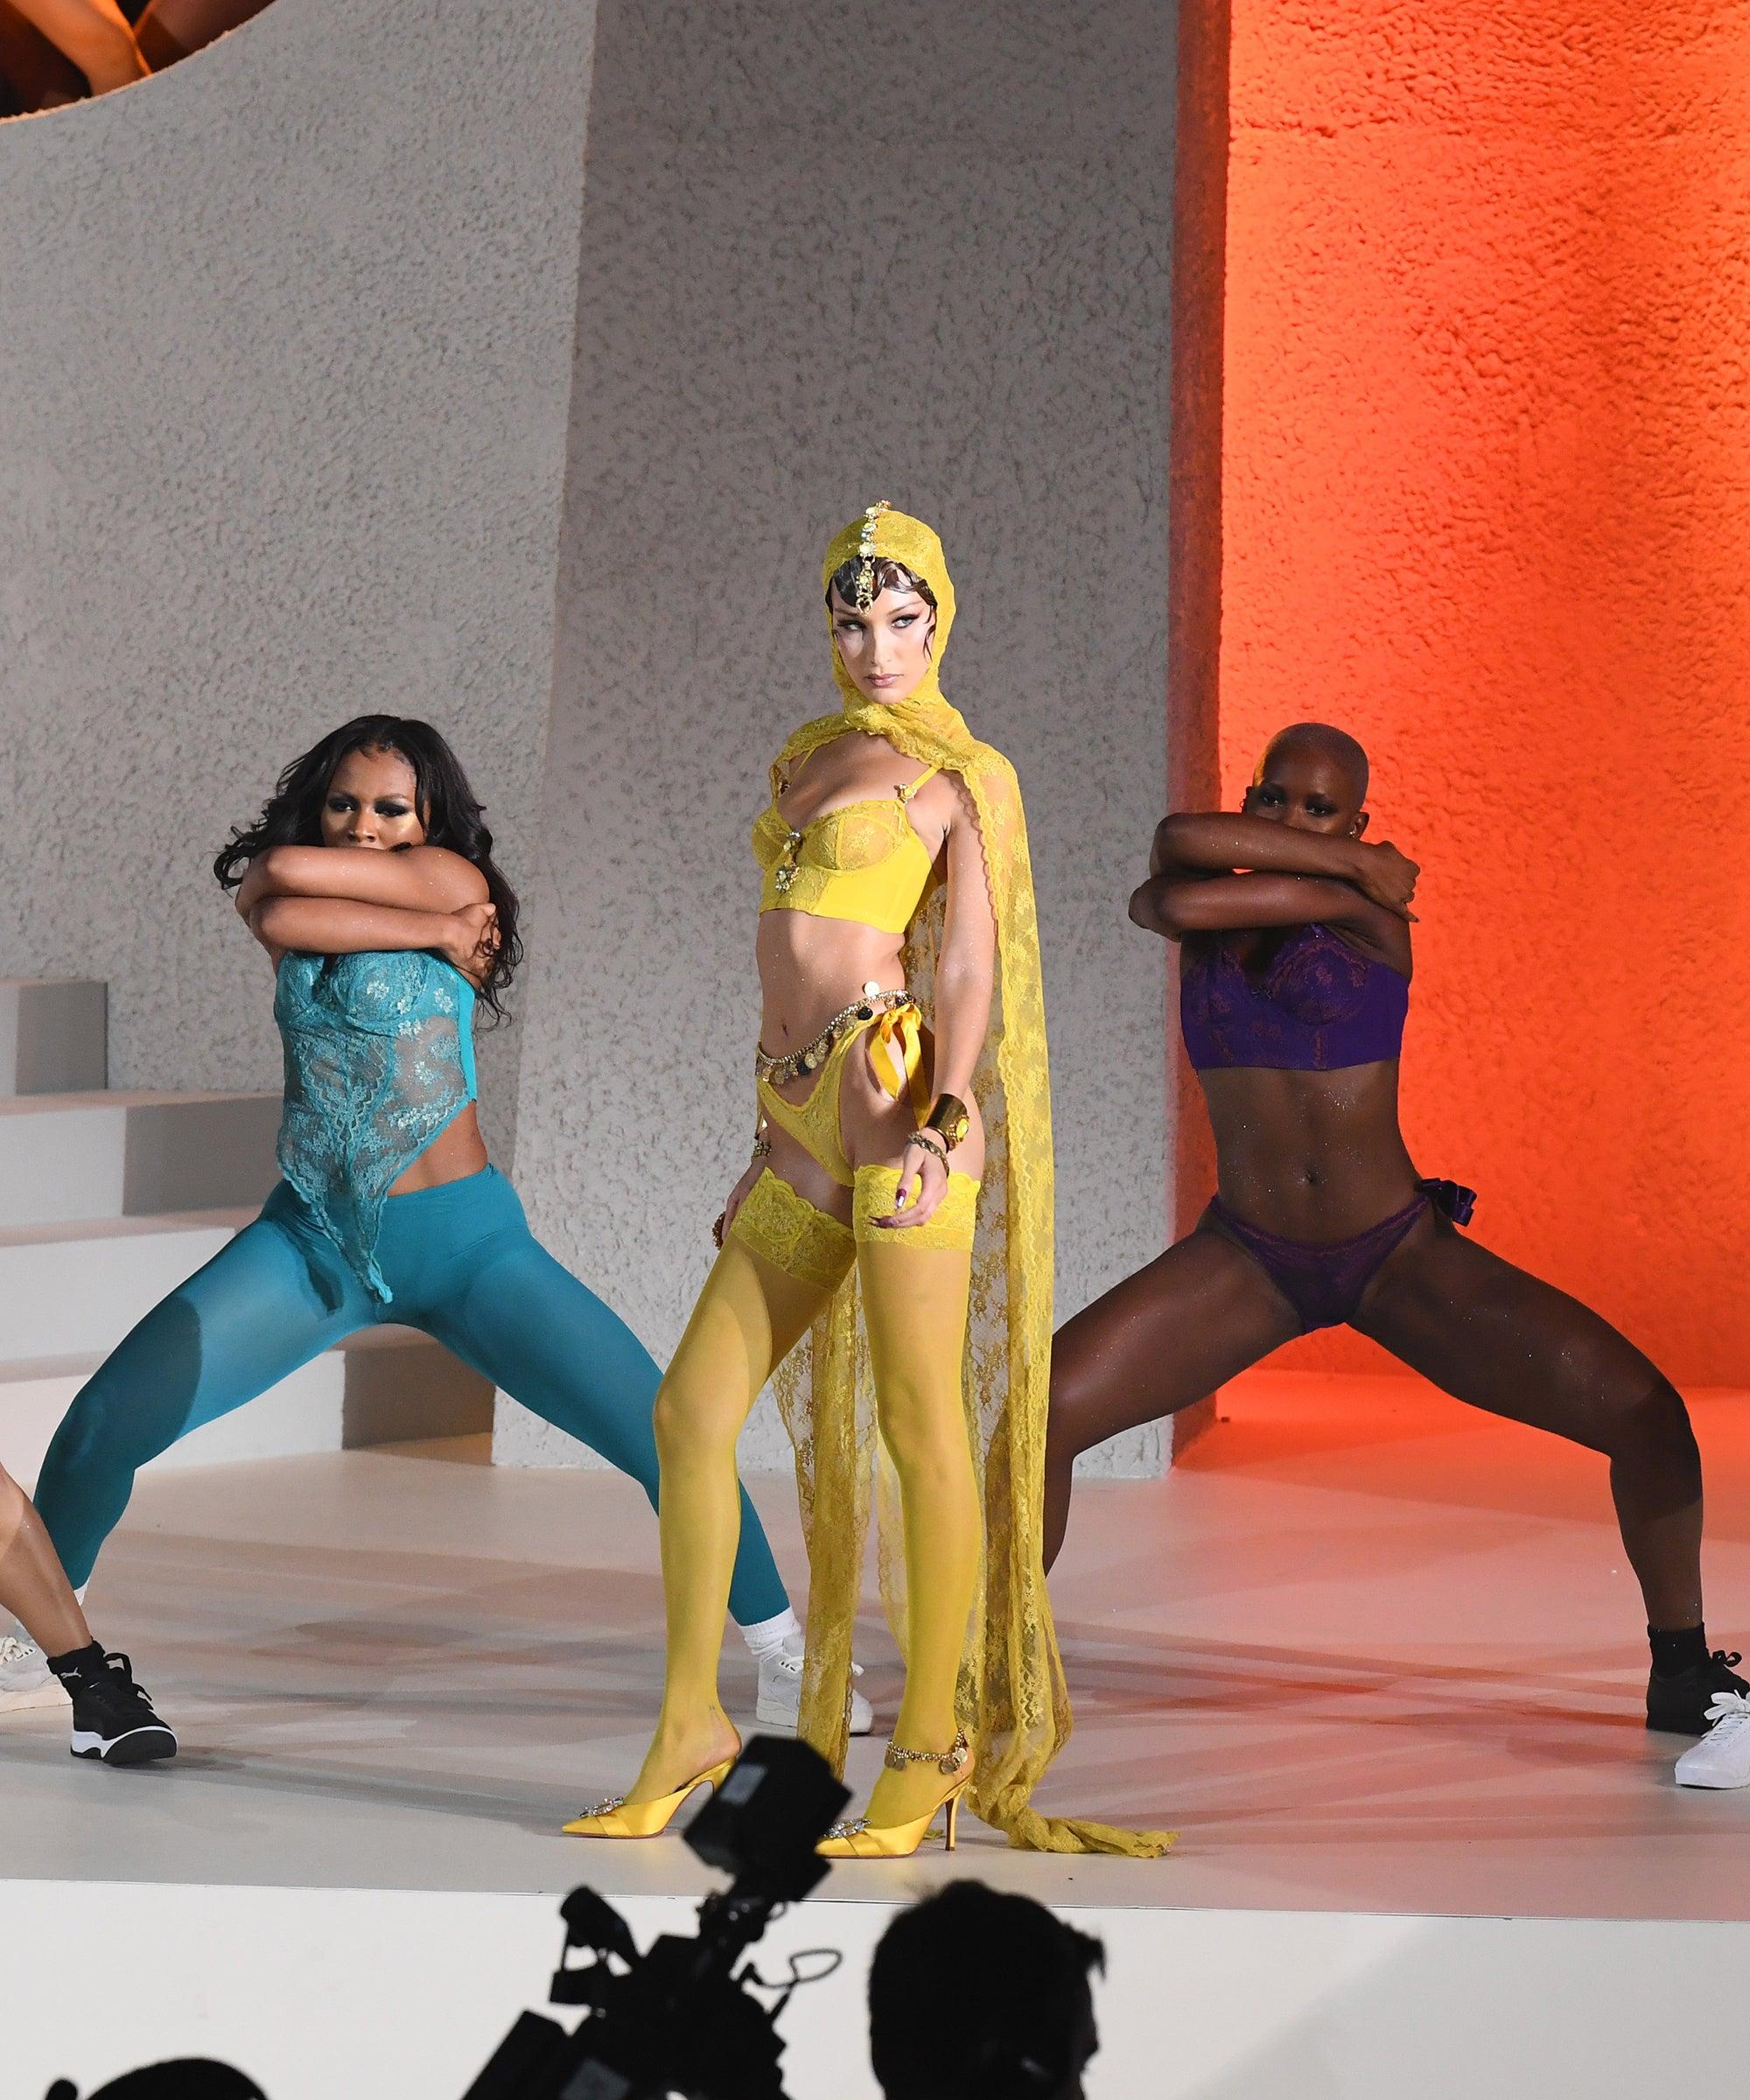 Shop Rihanna's Savage x Fenty Show As You Watch It On Amazon